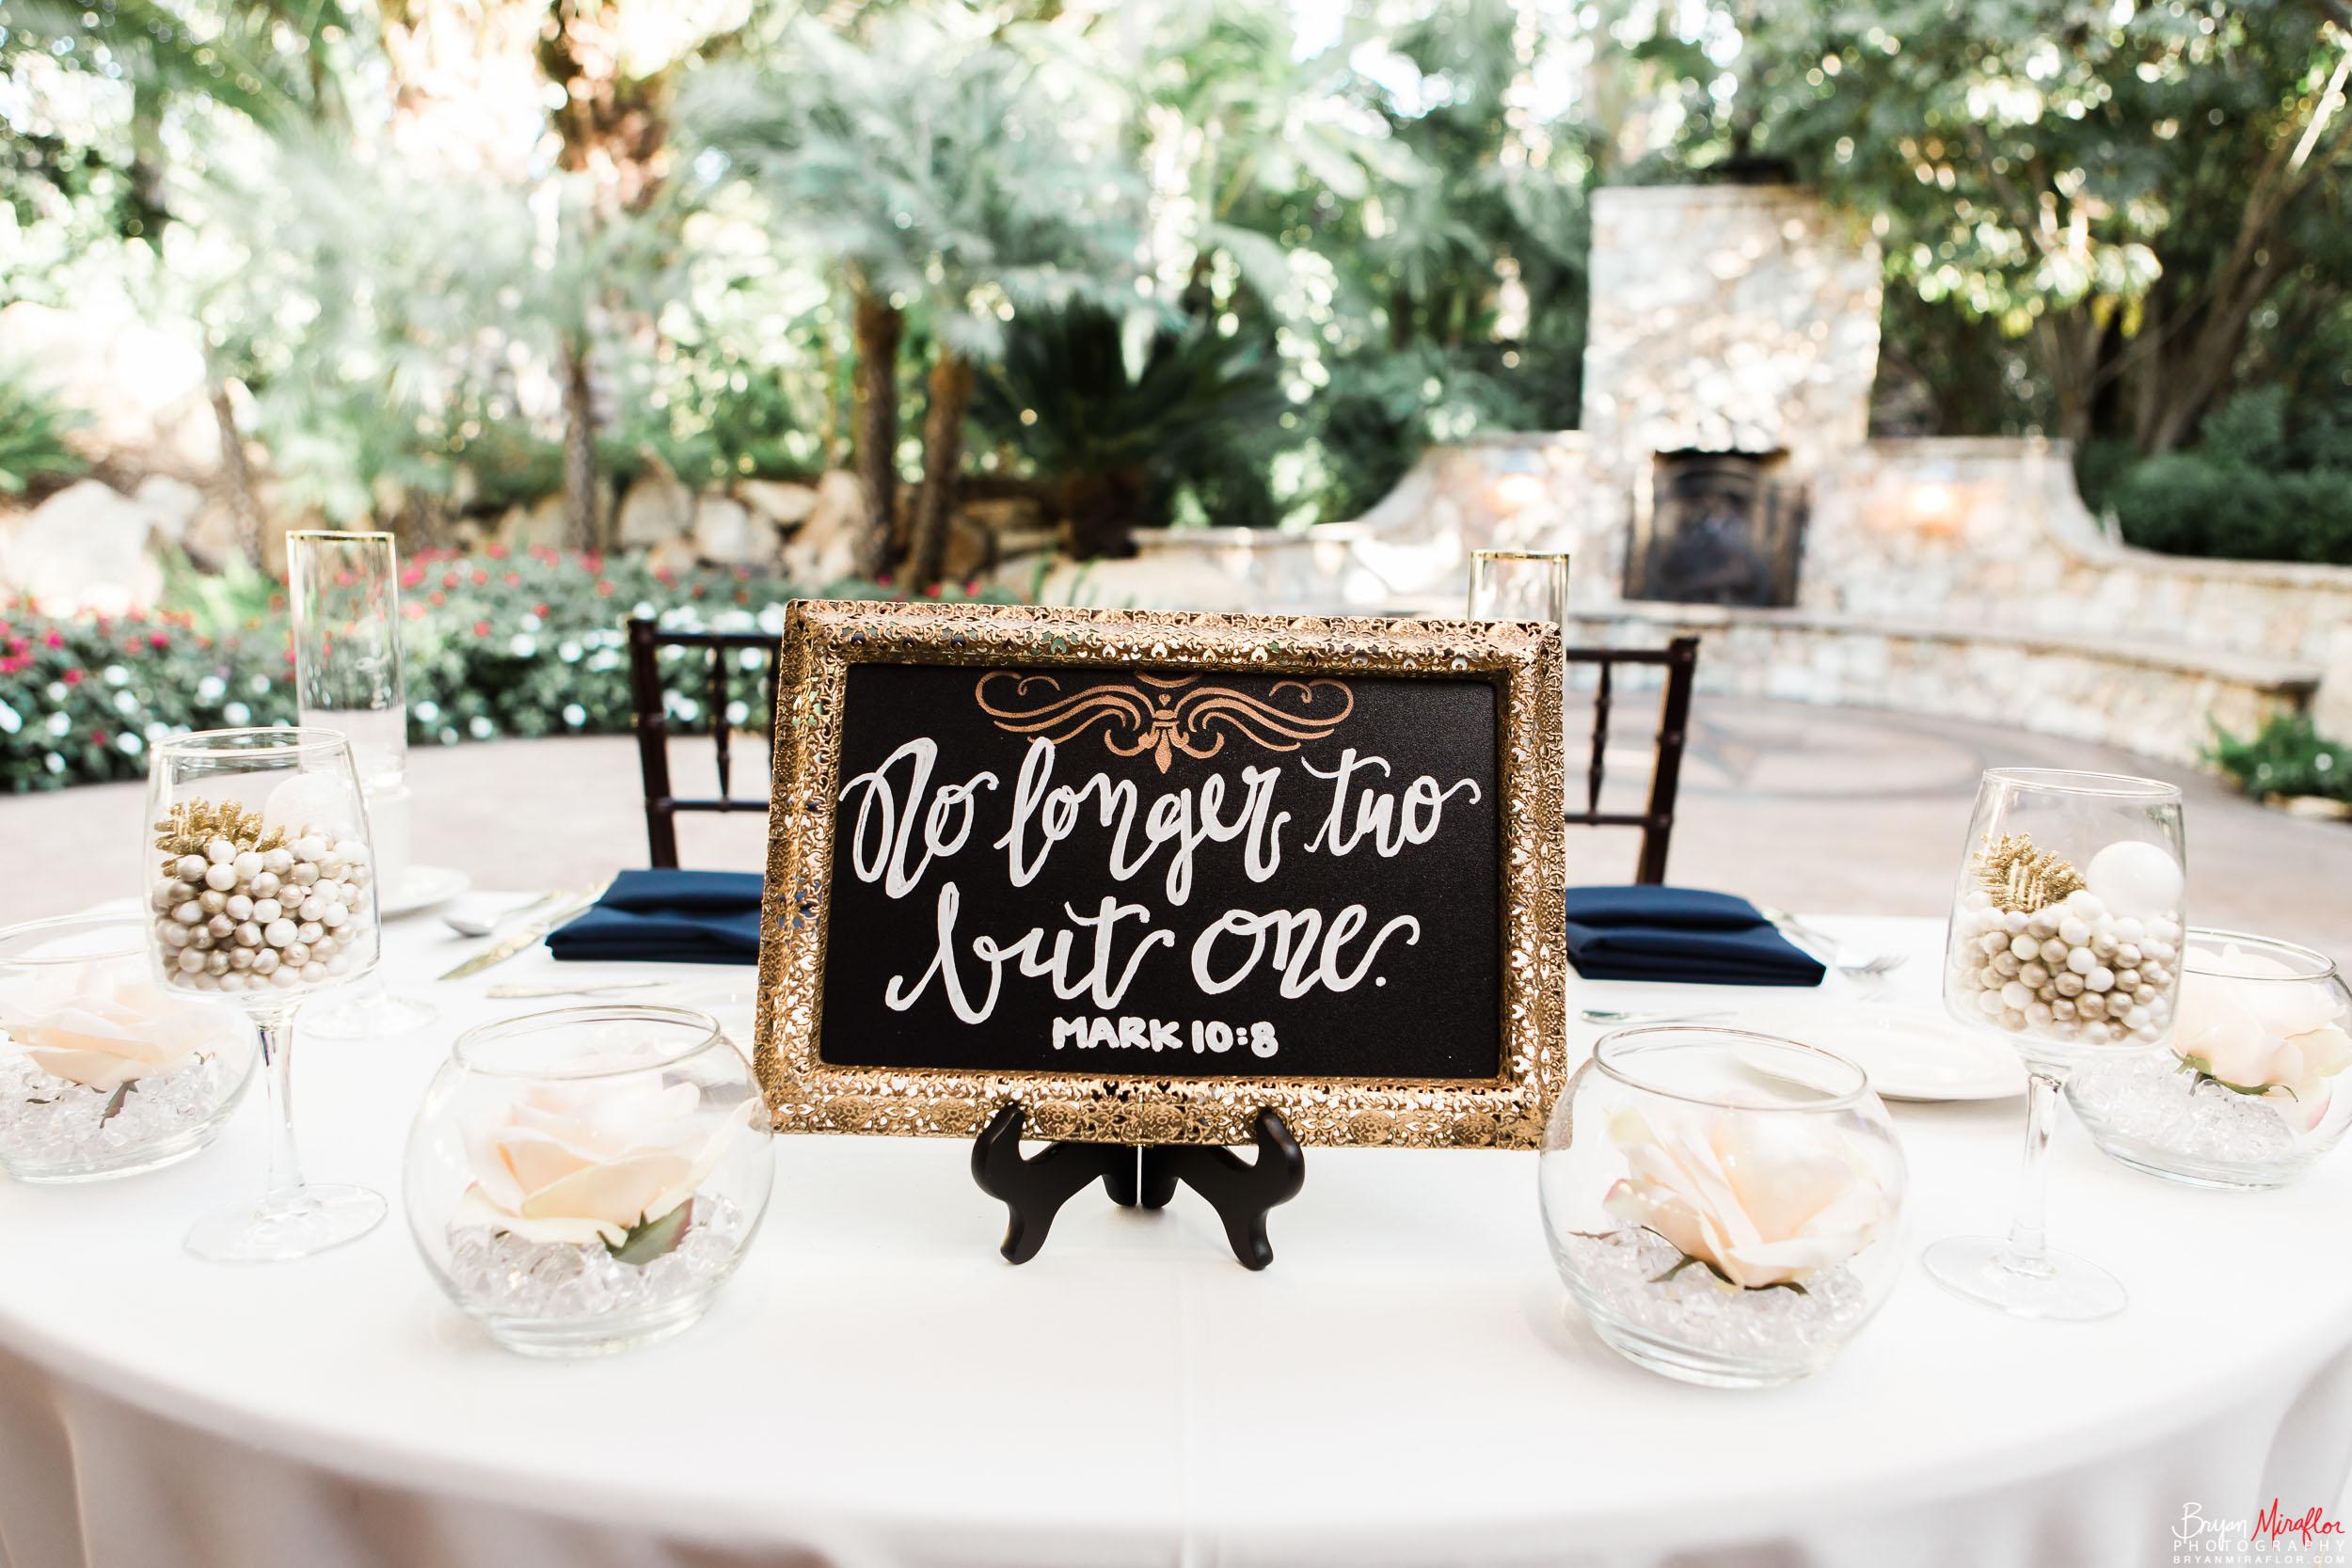 Bryan-Miraflor-Photography-Hannah-Jonathan-Married-Grand-Traditions-Estate-Gardens-Fallbrook-20171222-155.jpg